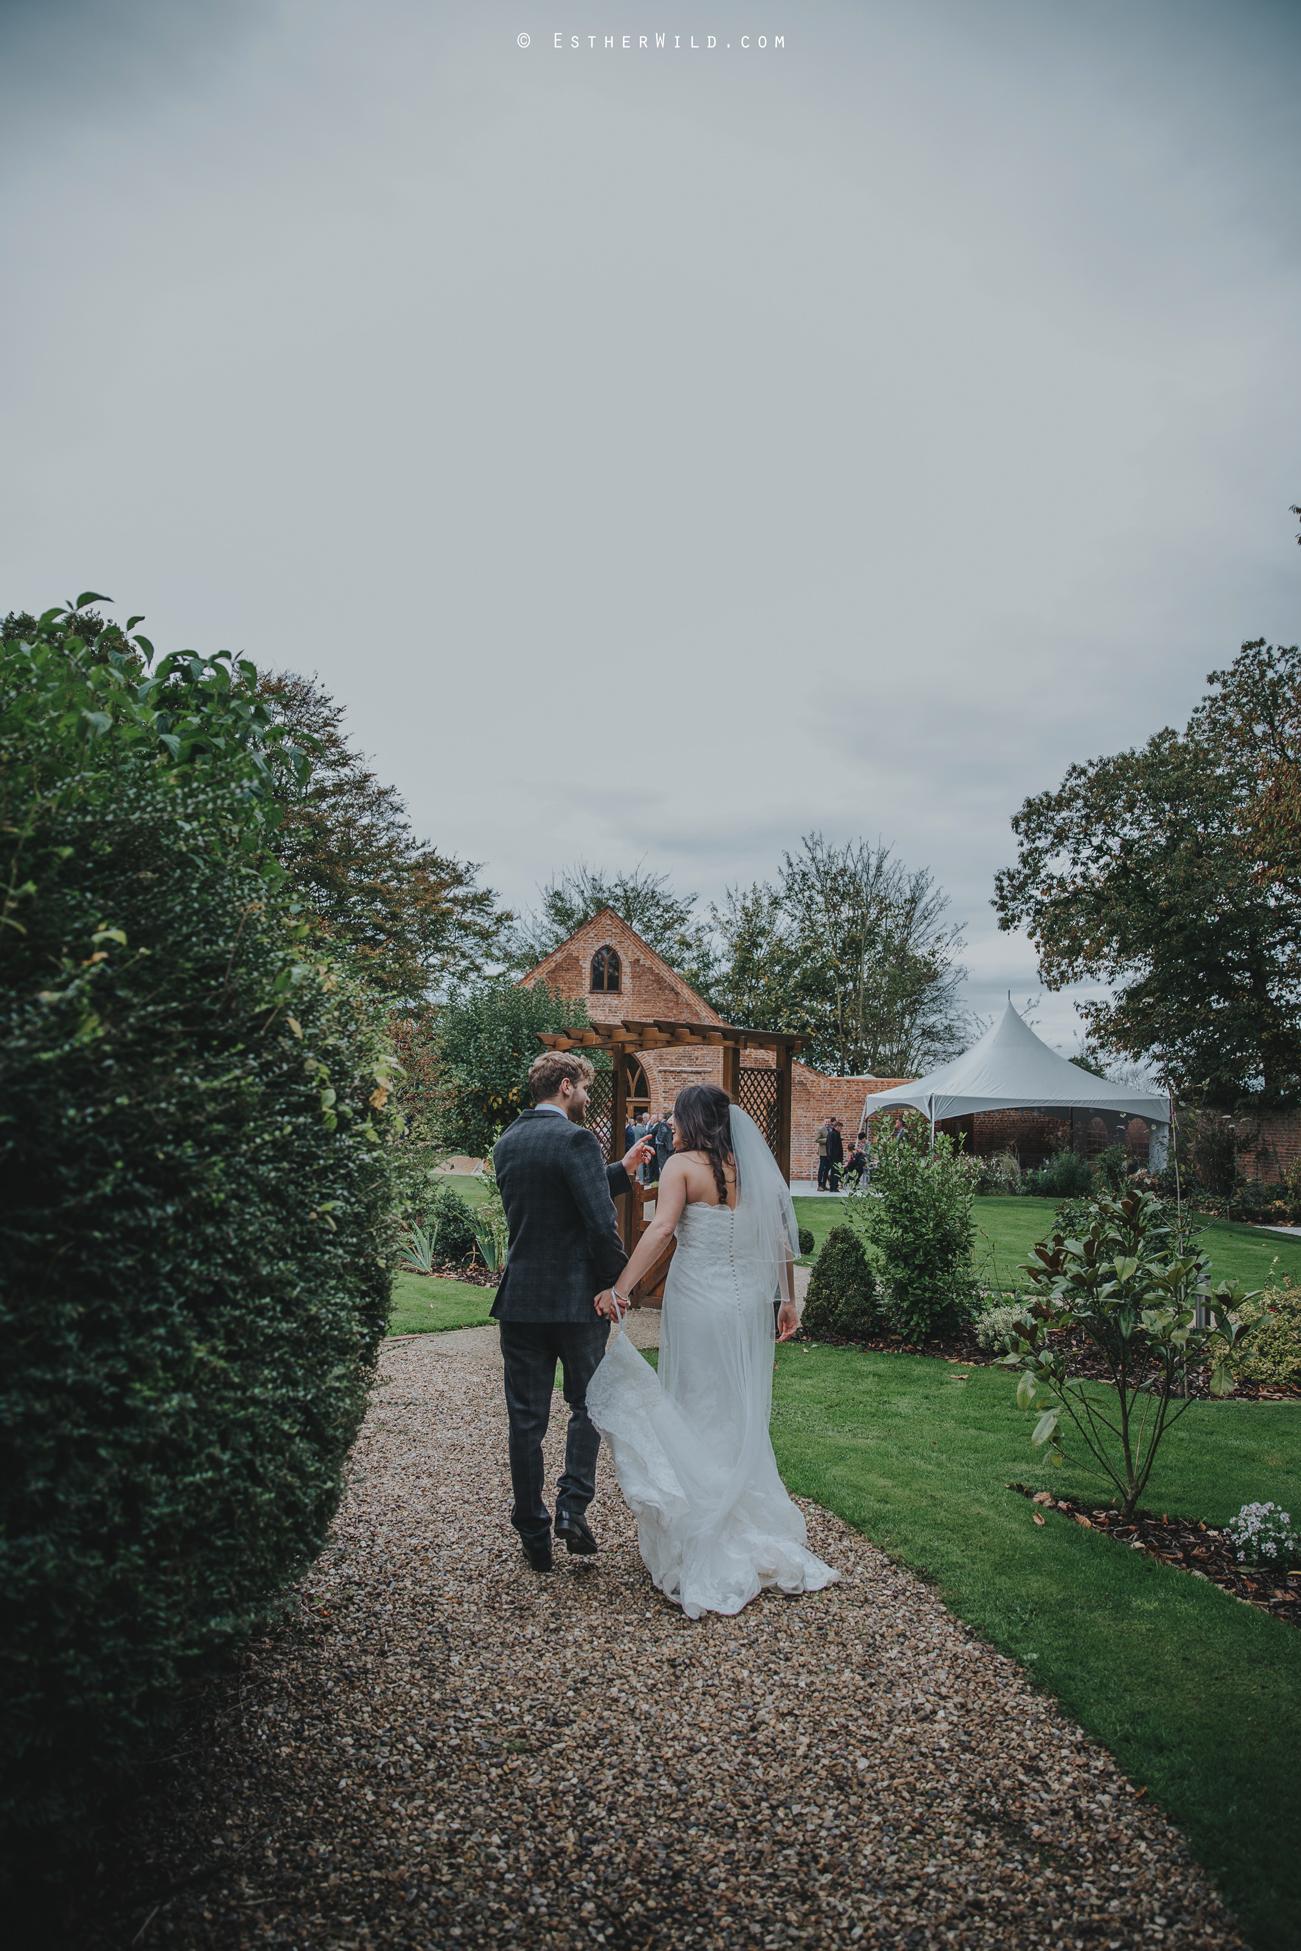 Reading_Room_Weddings_Alby_Norwich_Photographer_Esther_Wild_IMG_1882.jpg